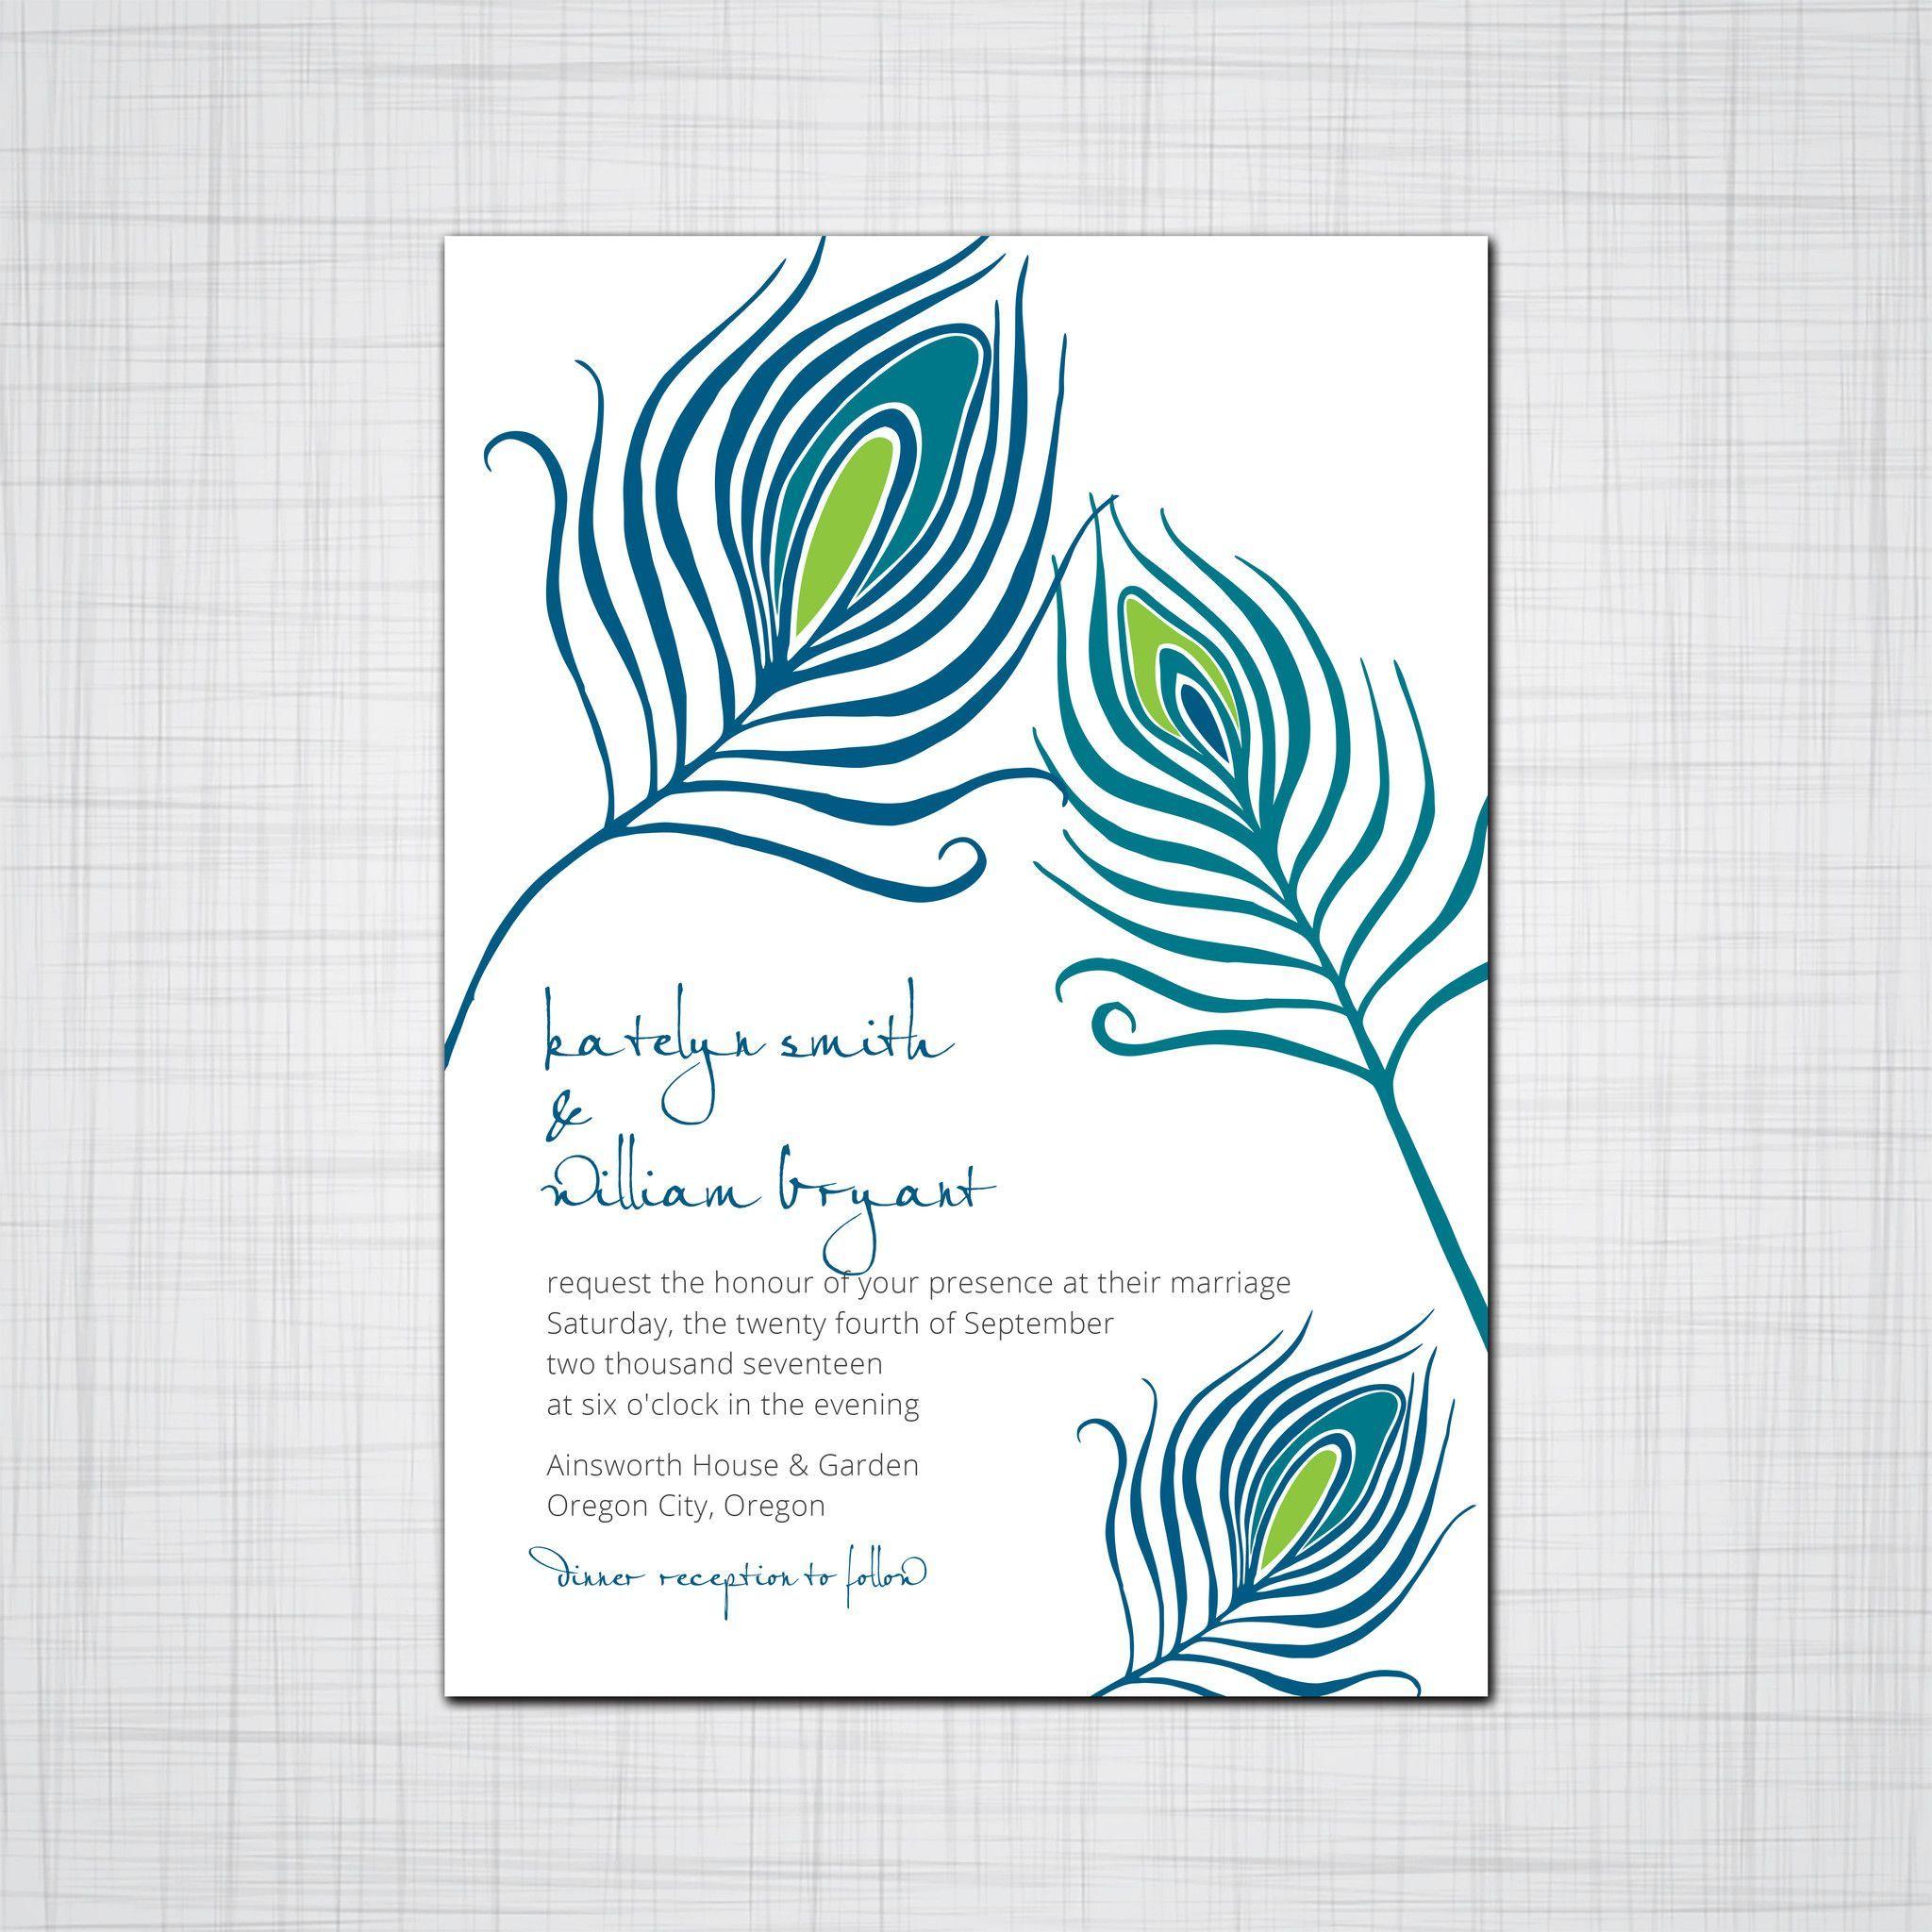 Peacock feather wedding invitations bird feather event invitations